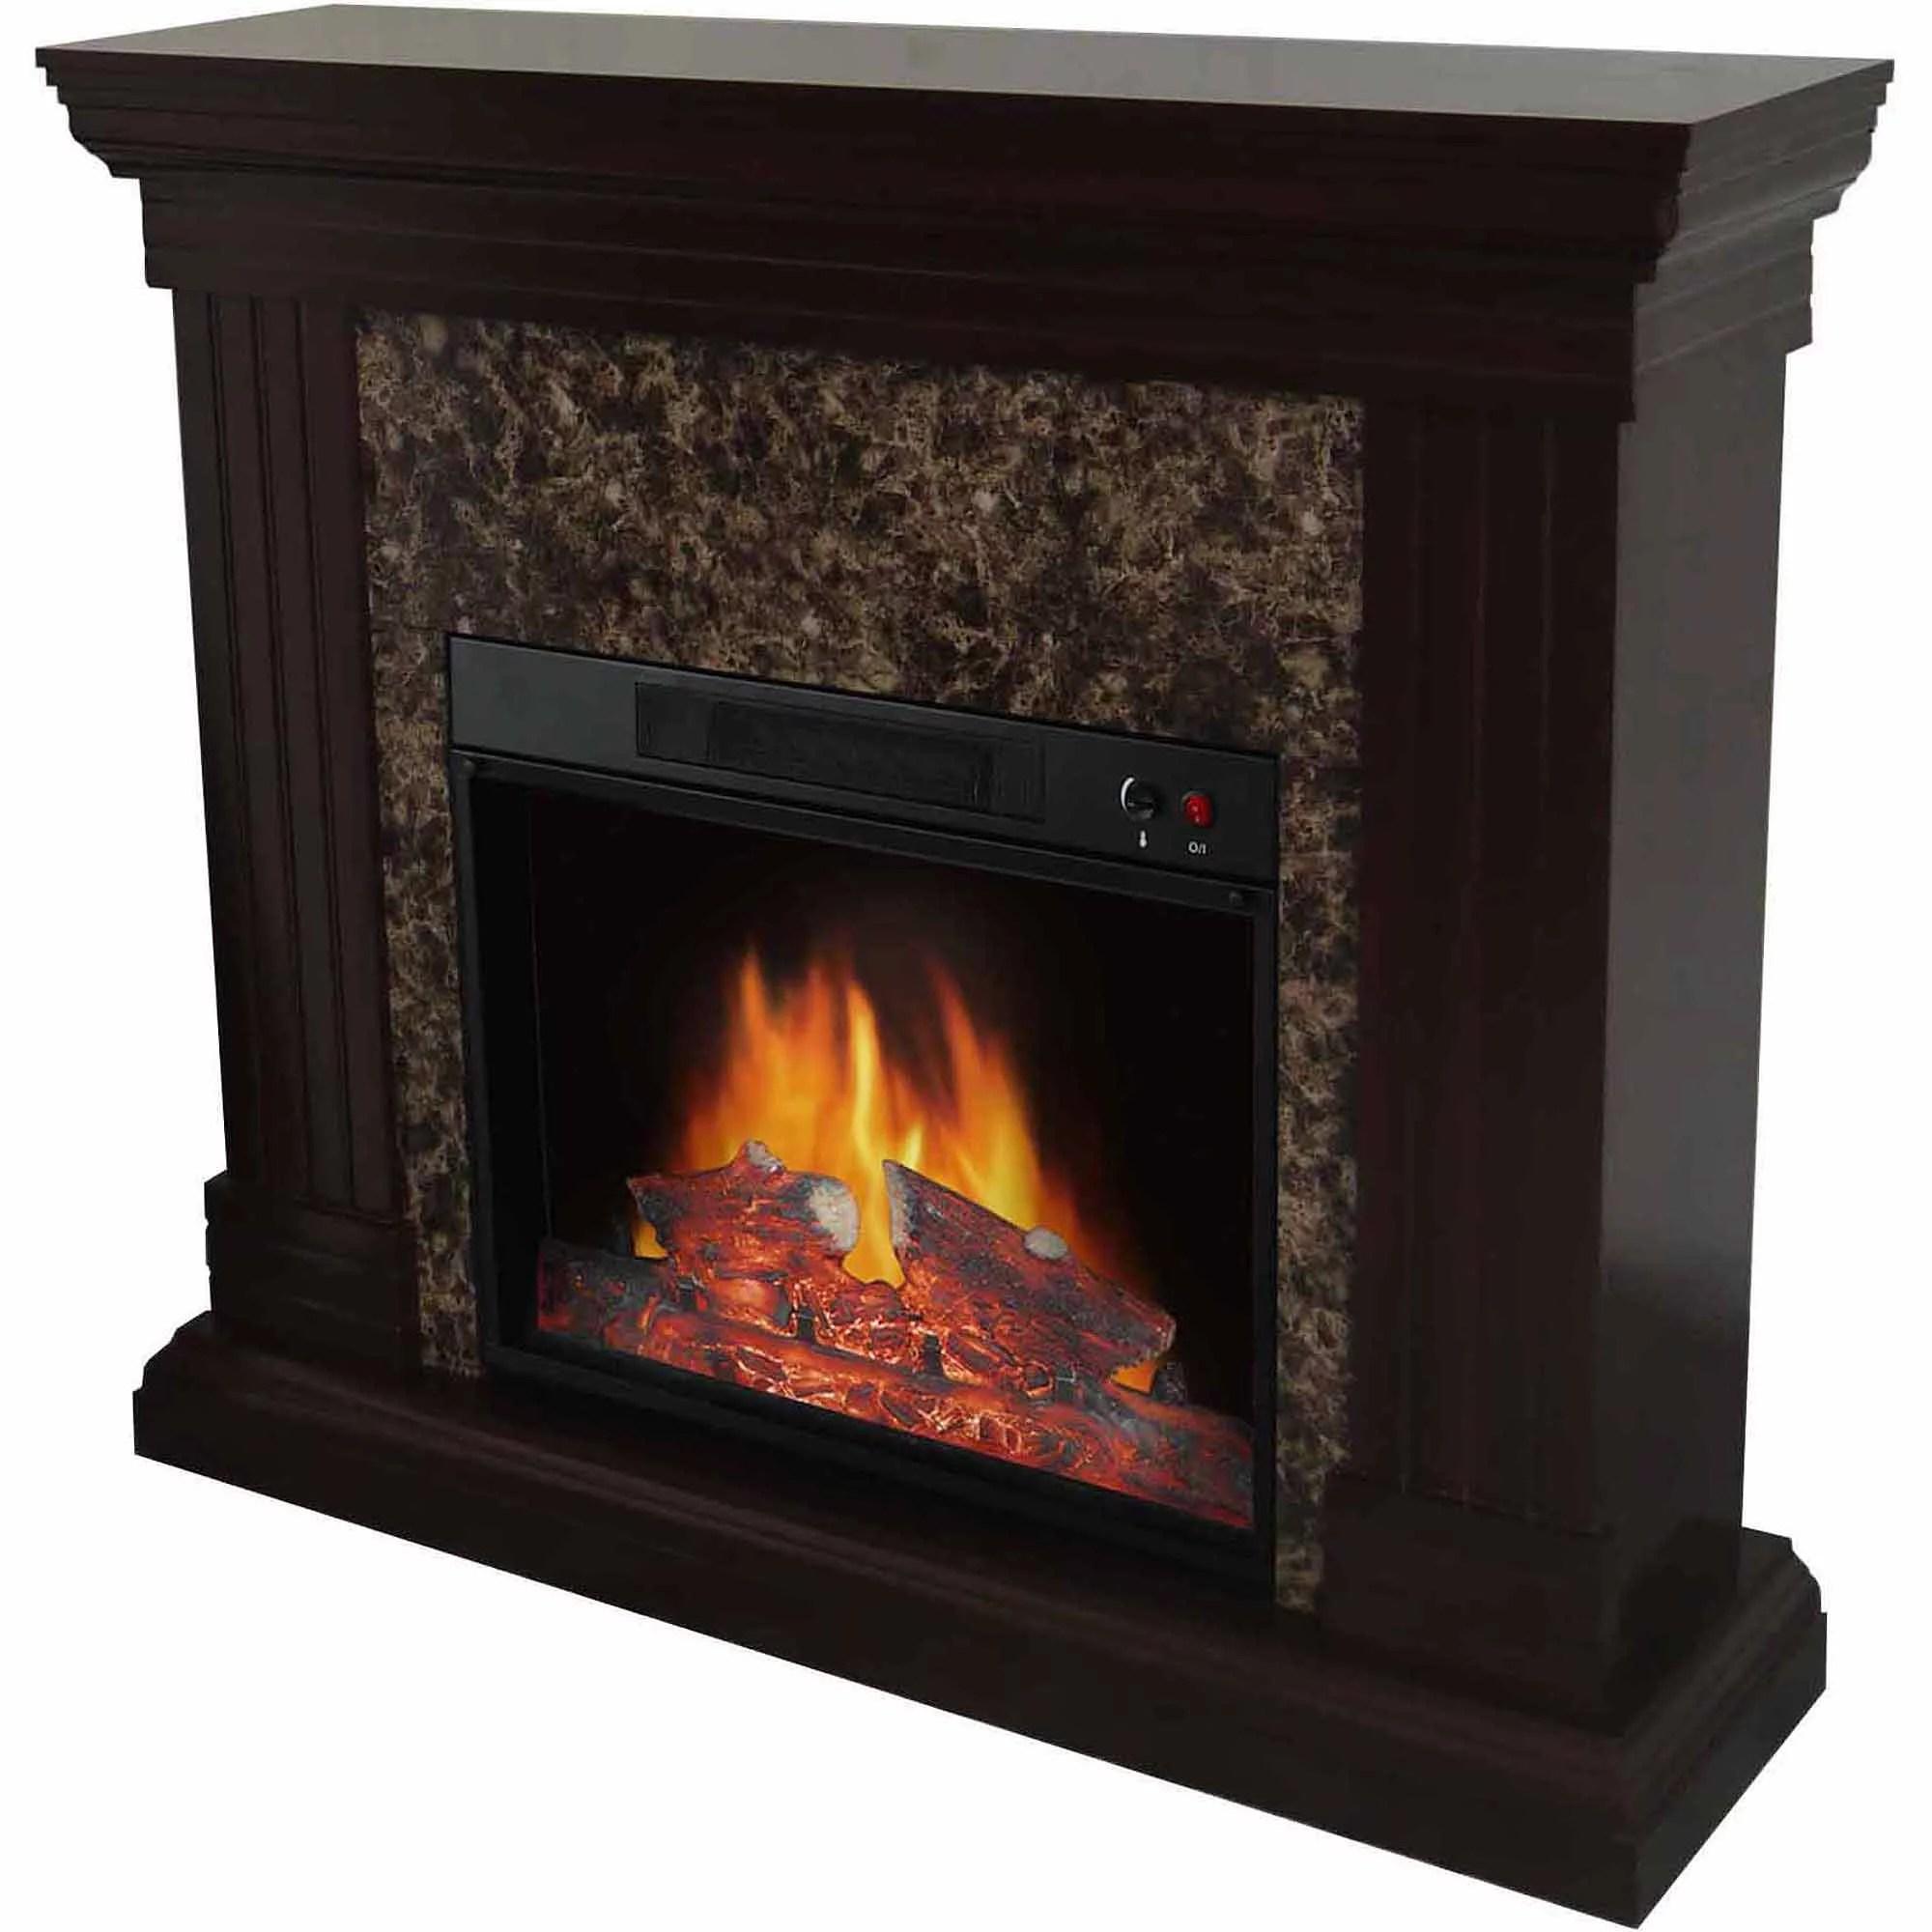 Lifepro Lifesmart Infrared Quartz Heater Mini Fireplace